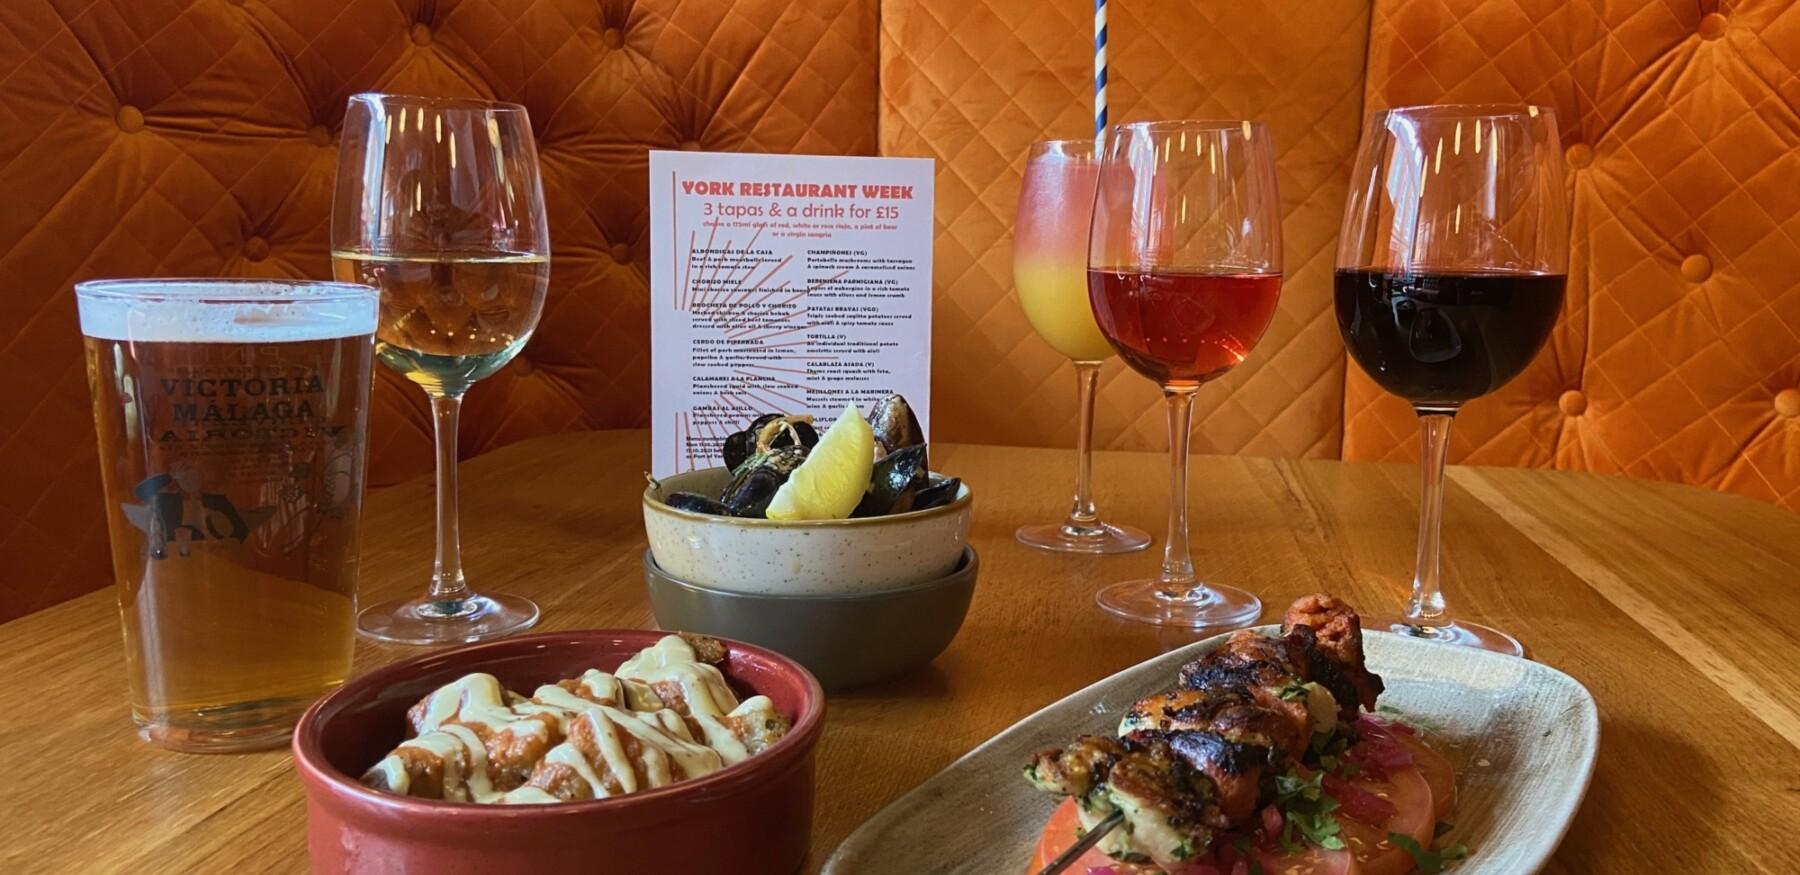 Evening menu food and drinks 4